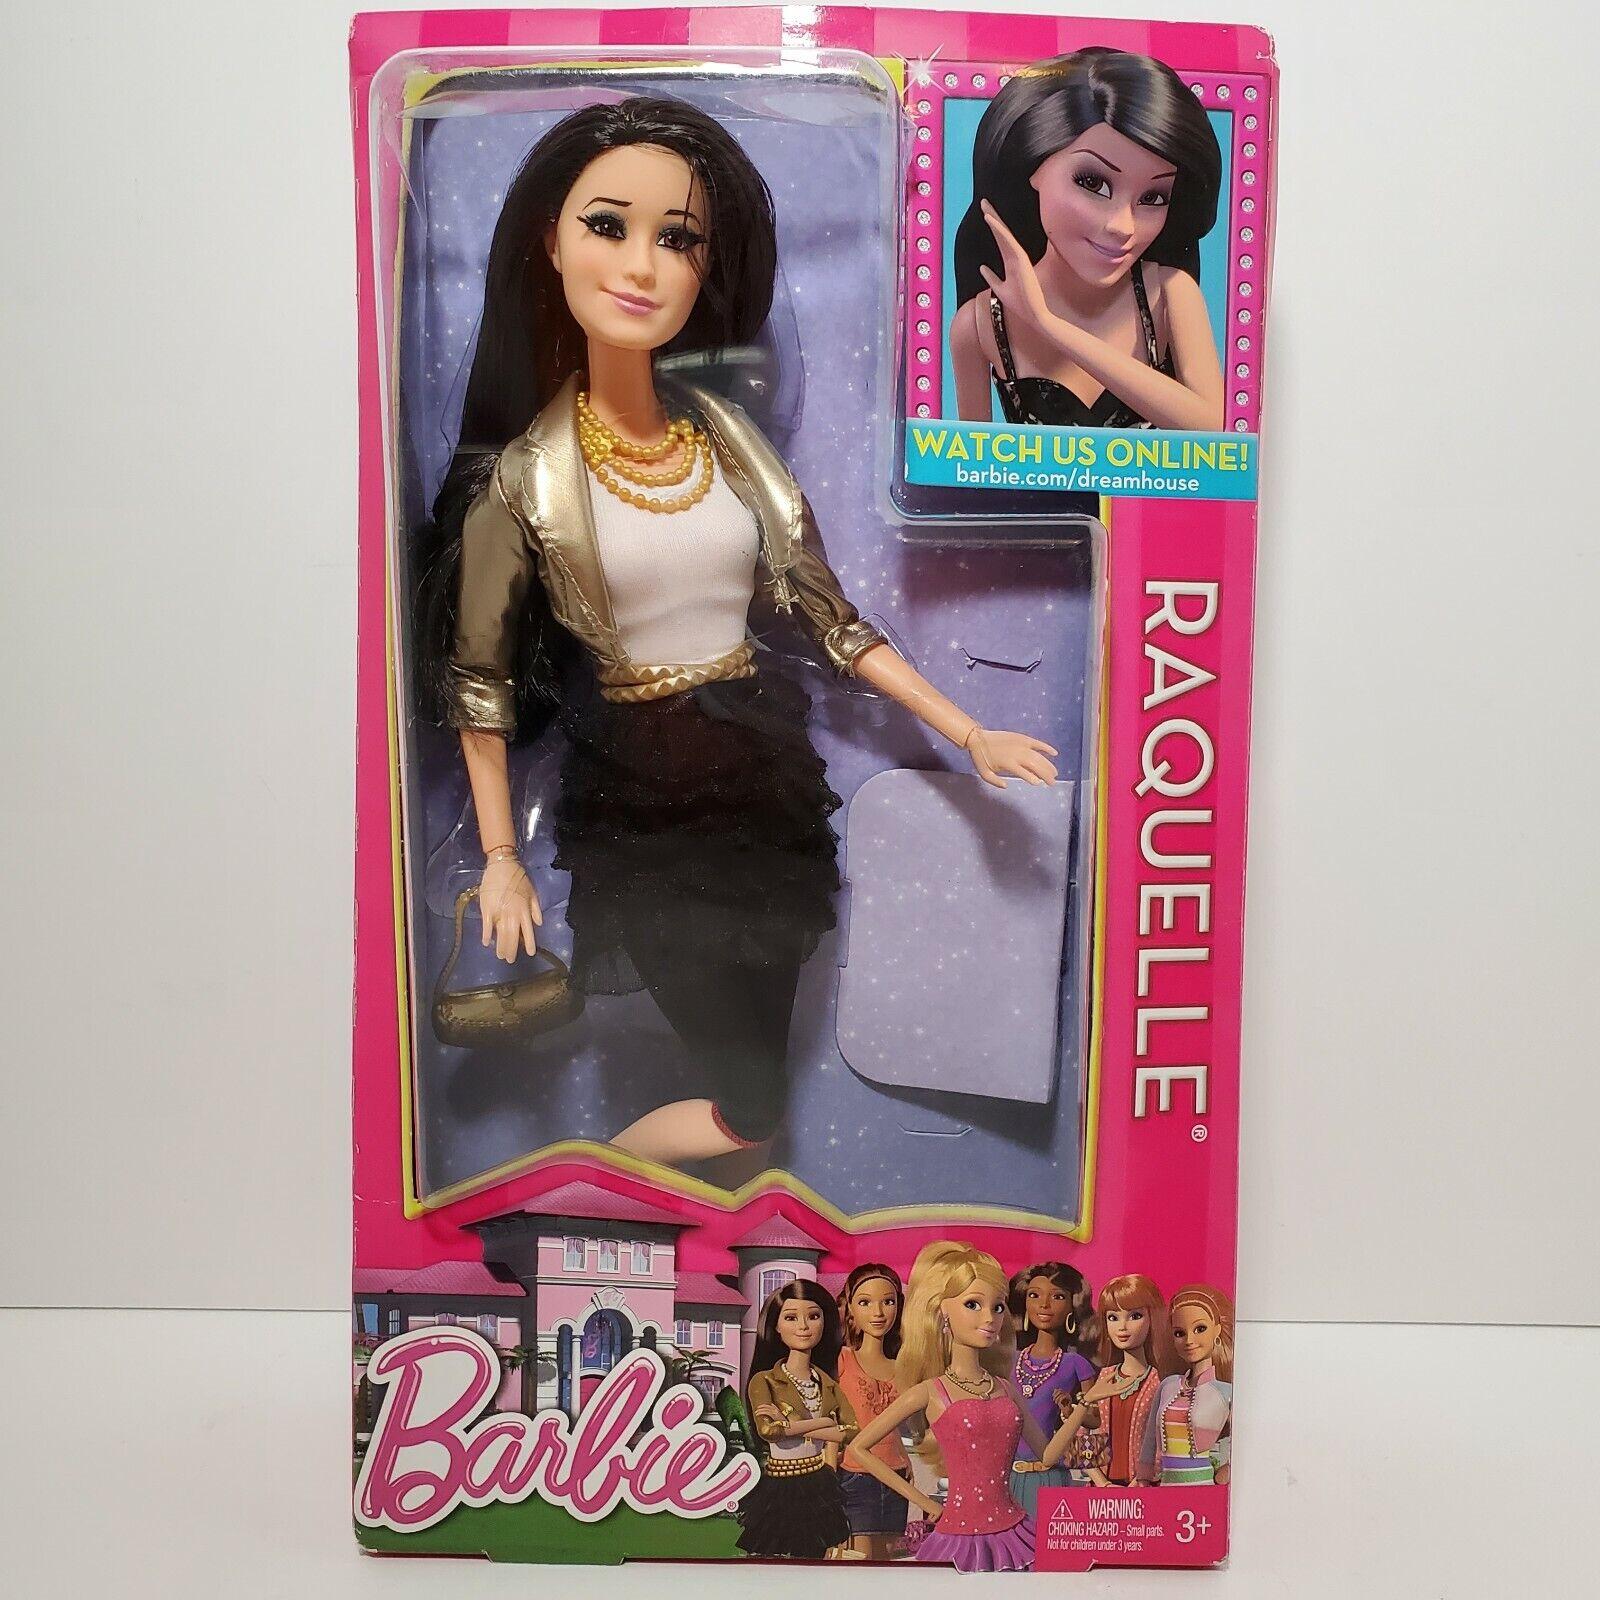 2015 Mattel Barbie Doll Raquelle Rooted Black Hair Model DGT80 for sale online